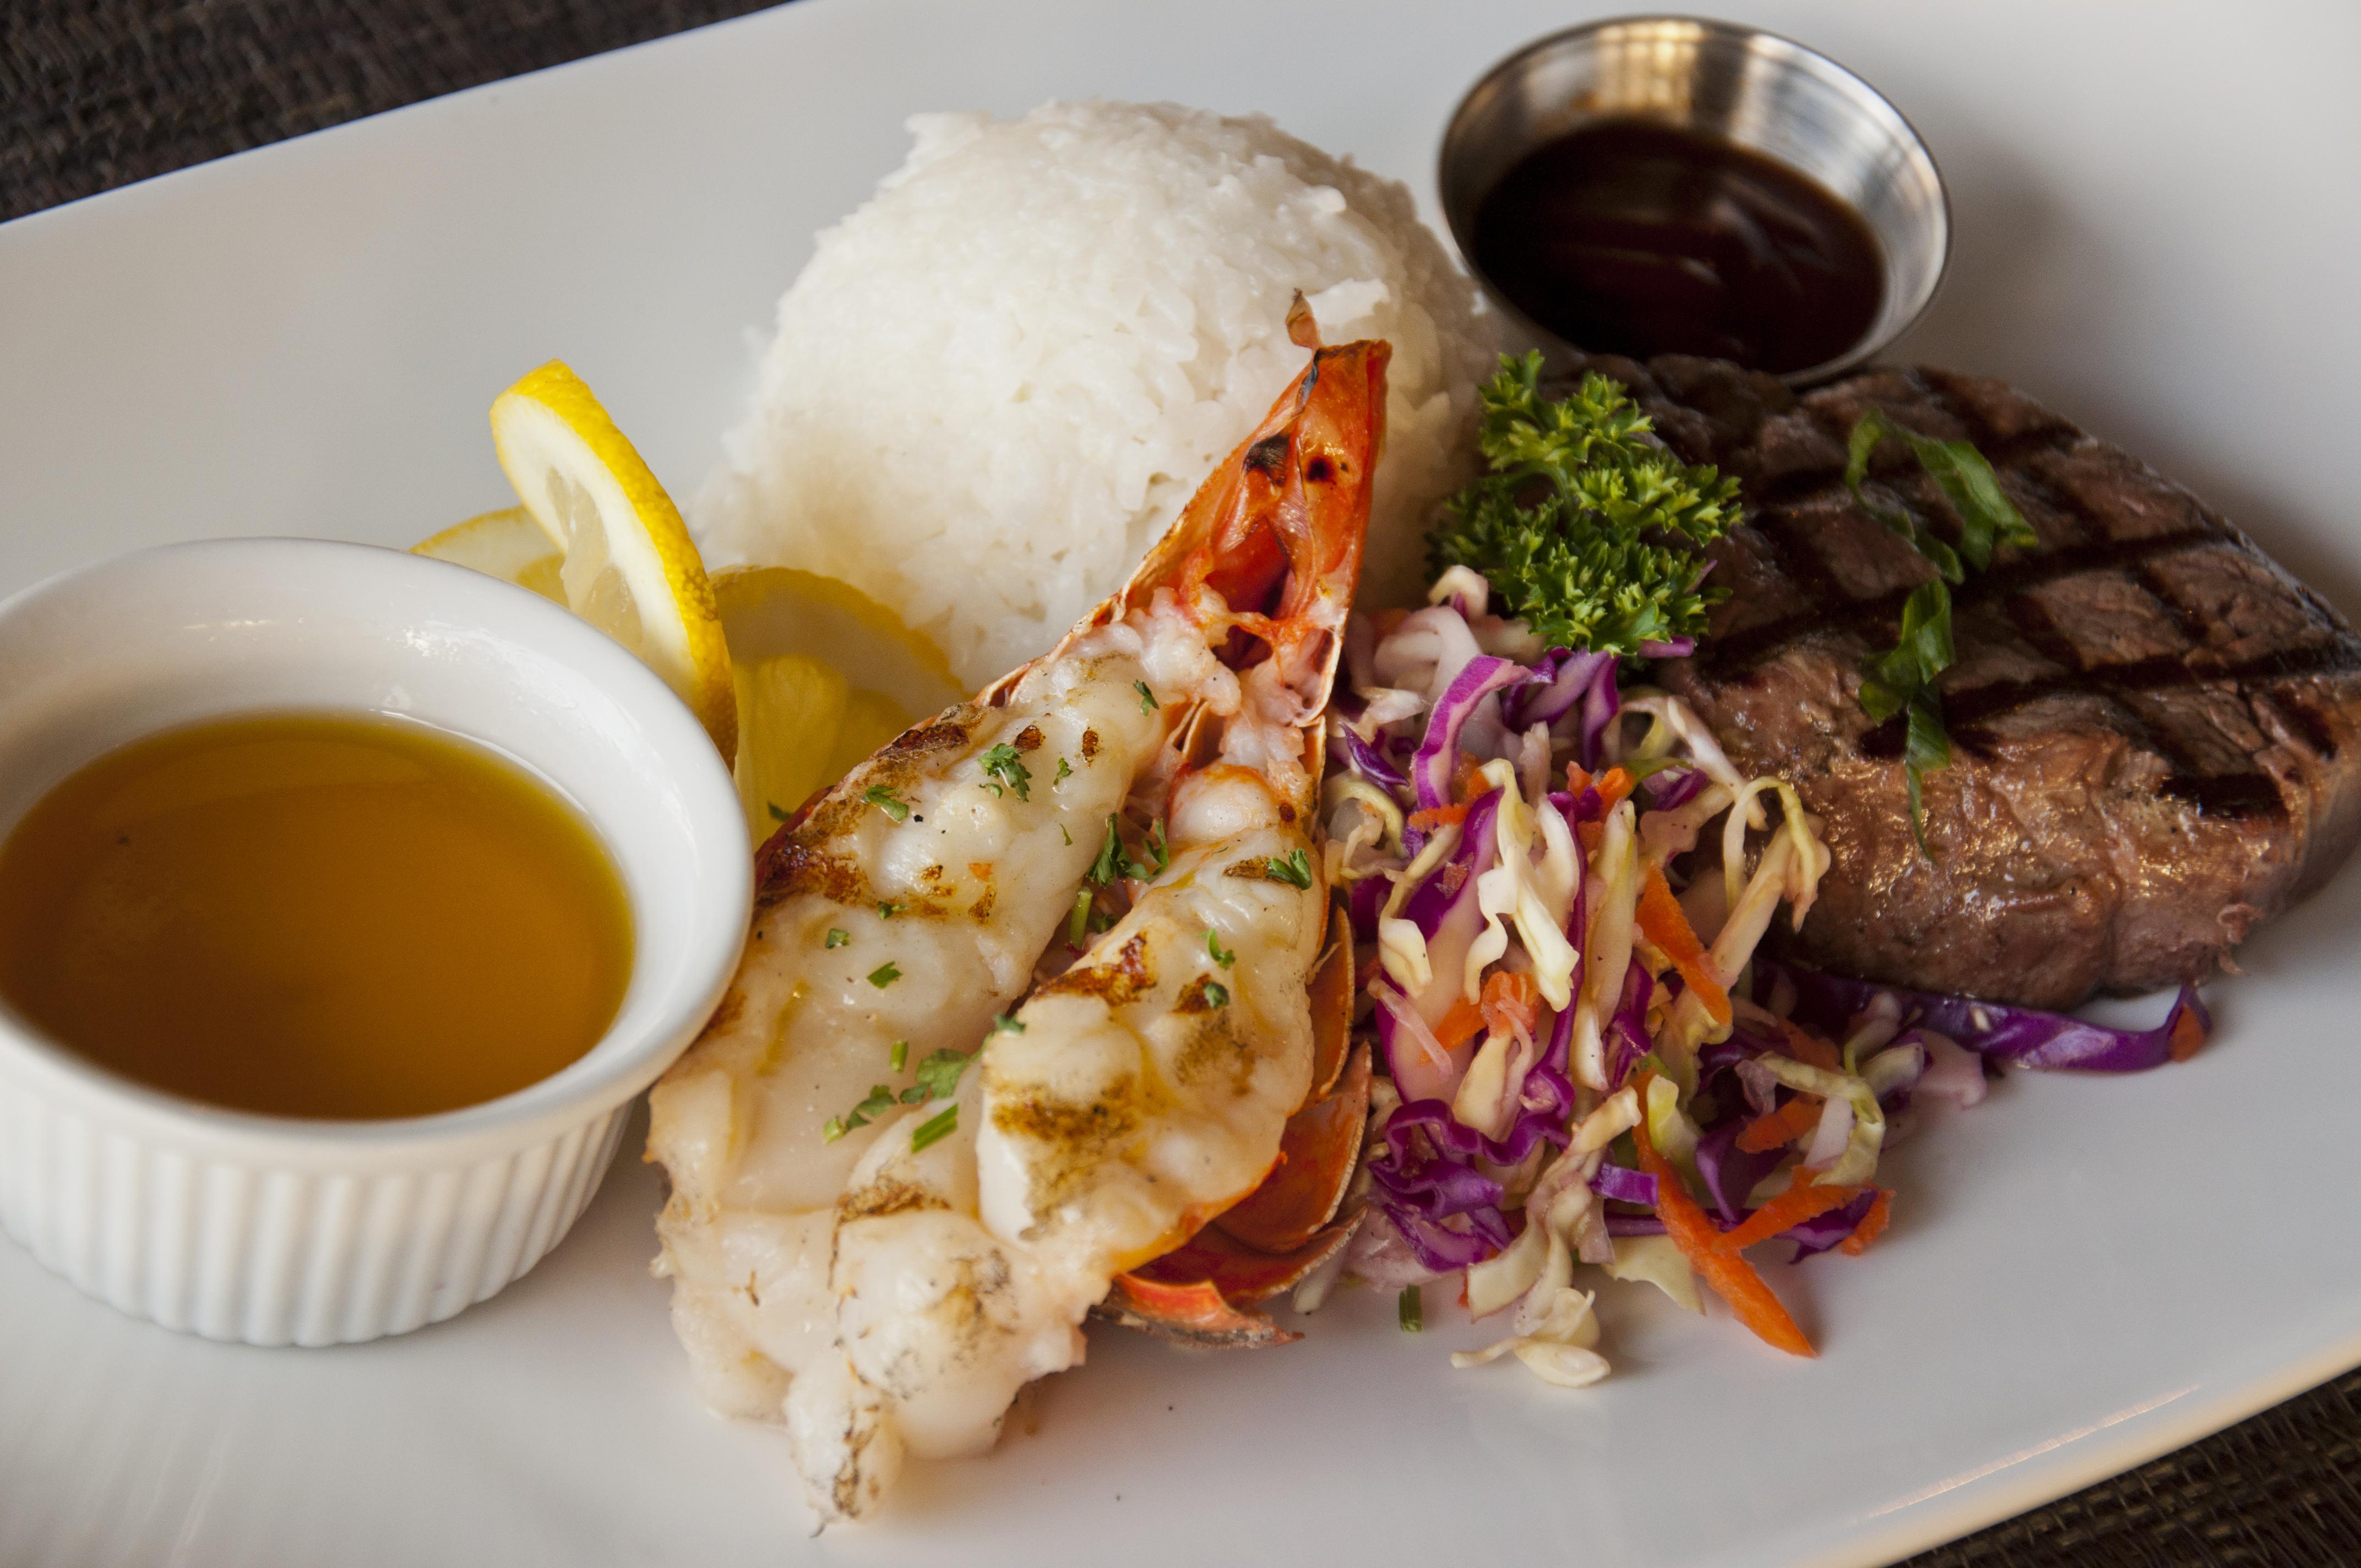 Tumon Bay Lobster & Grill - Guam